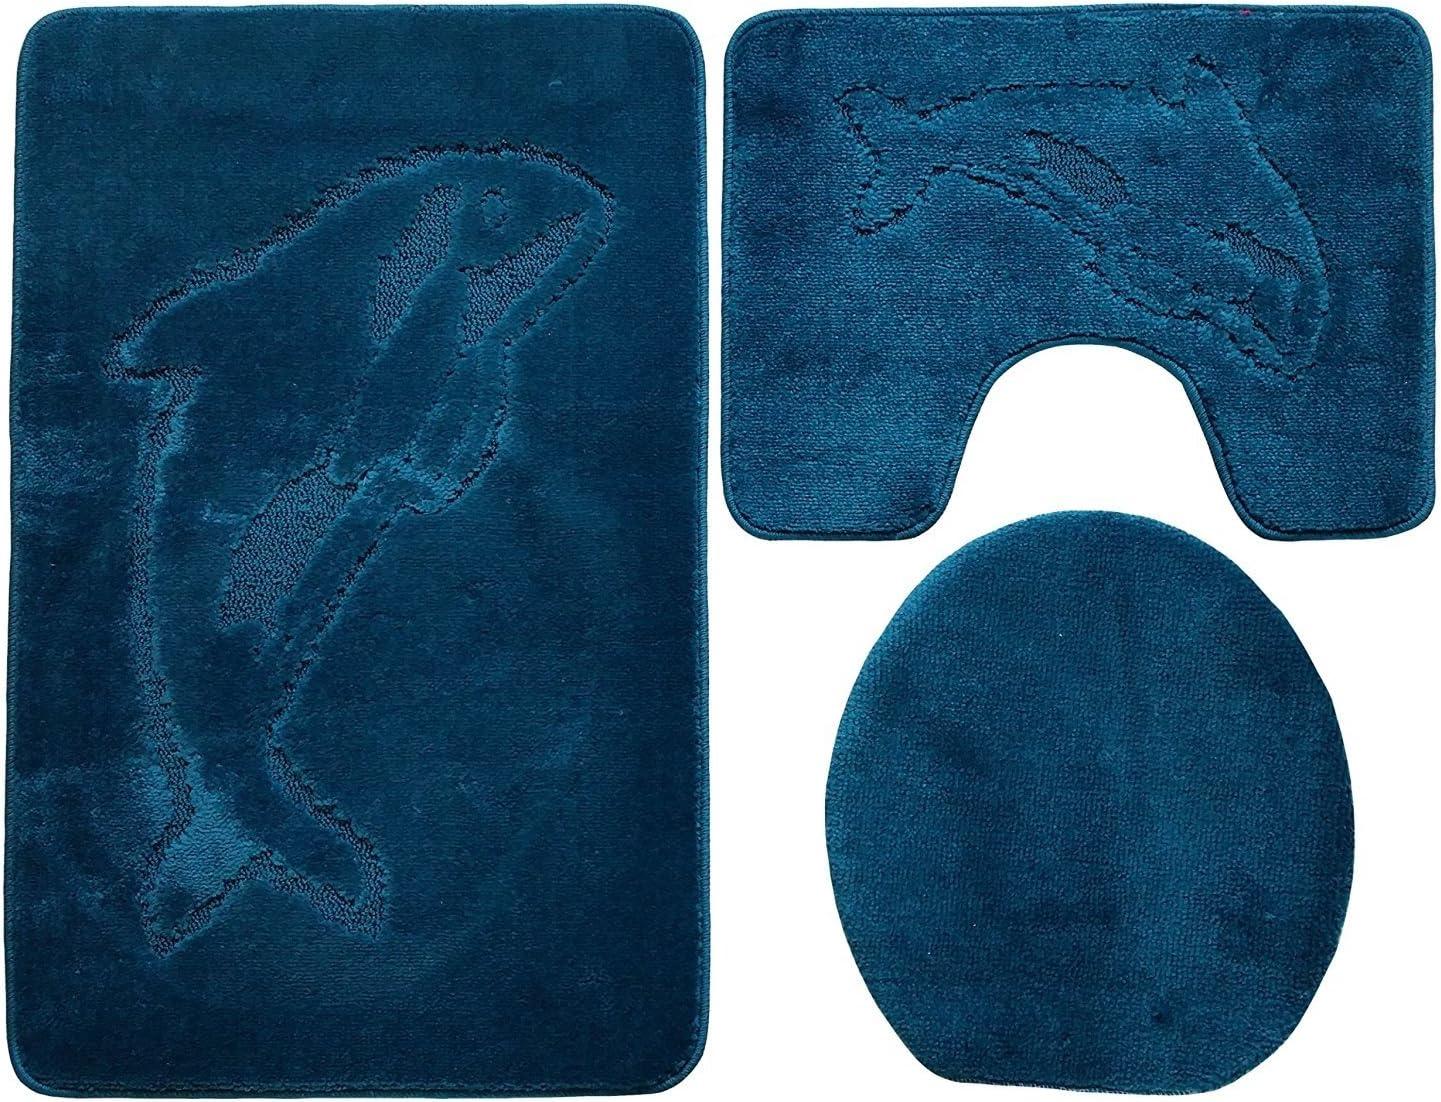 Ba/ño de 3/piezas Alfombrilla ba/ño alfombra 100/x 60/cm Petrol Azul ba/ño Delf/ín inodoro